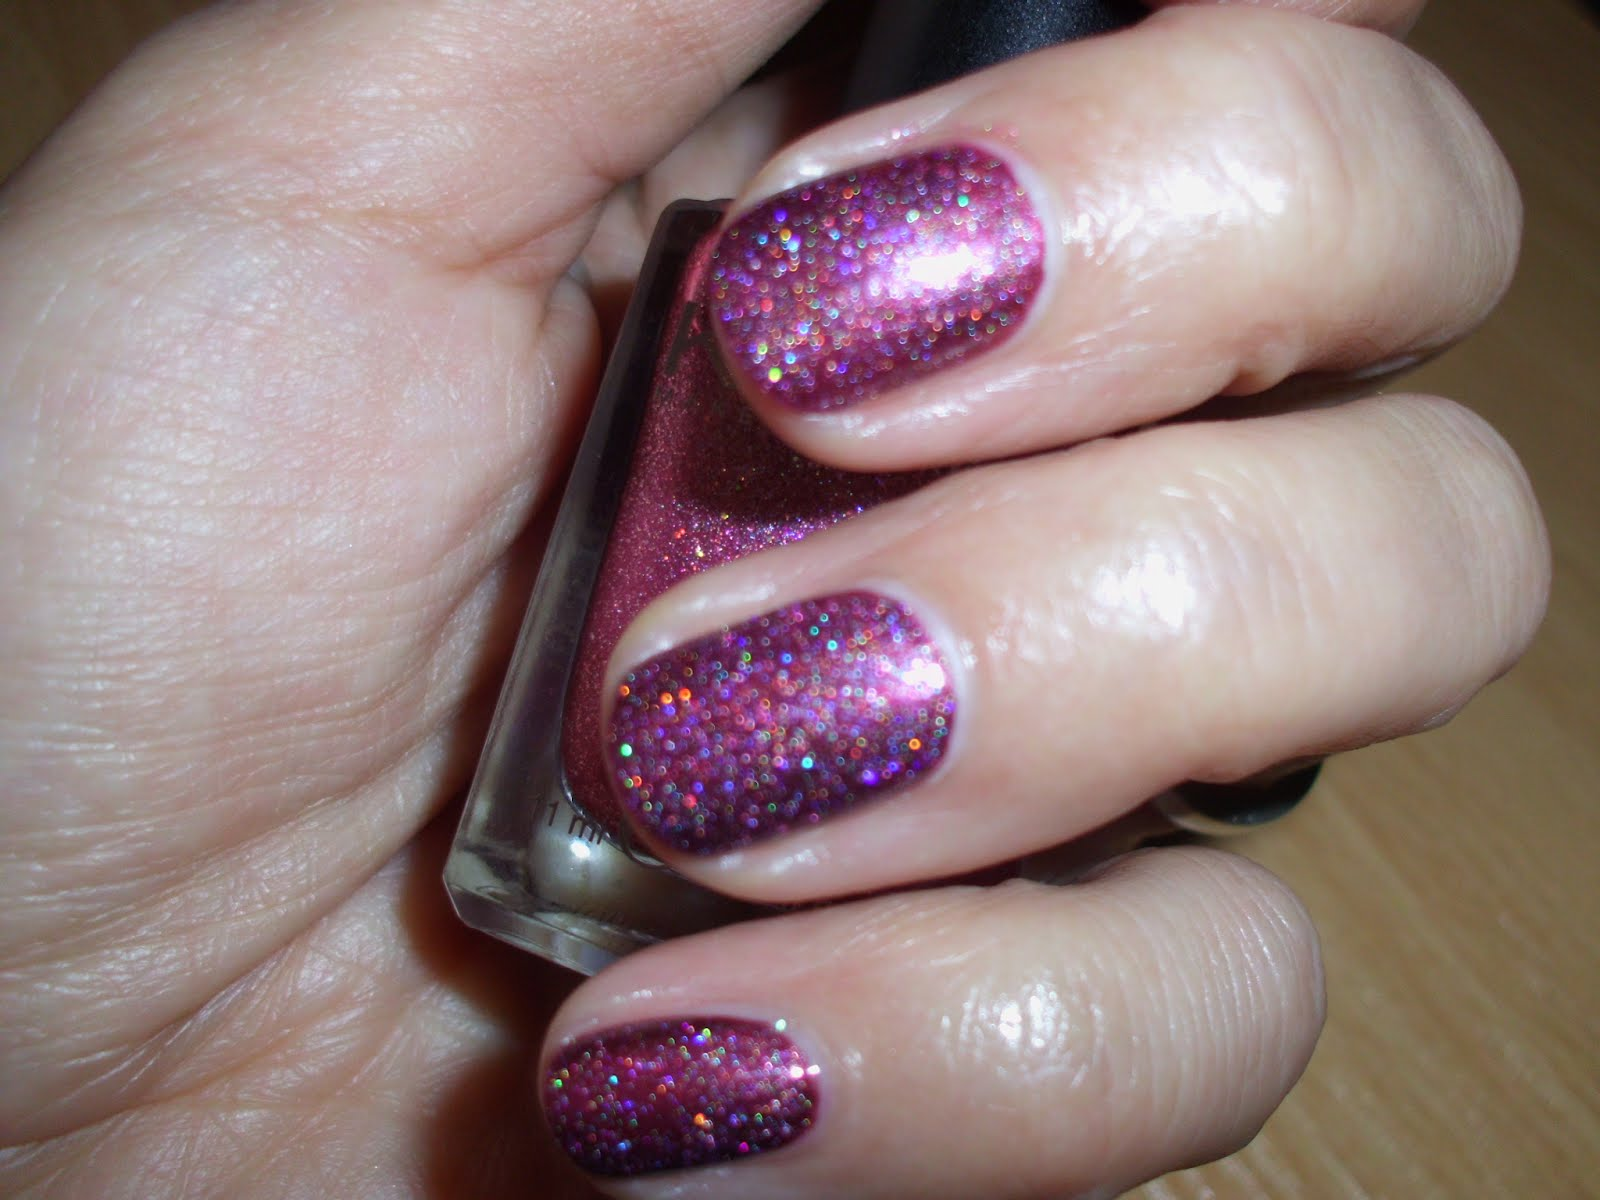 Mellisande: Nagellack Douglas Absolute Nails 13 precious + Kiko 247